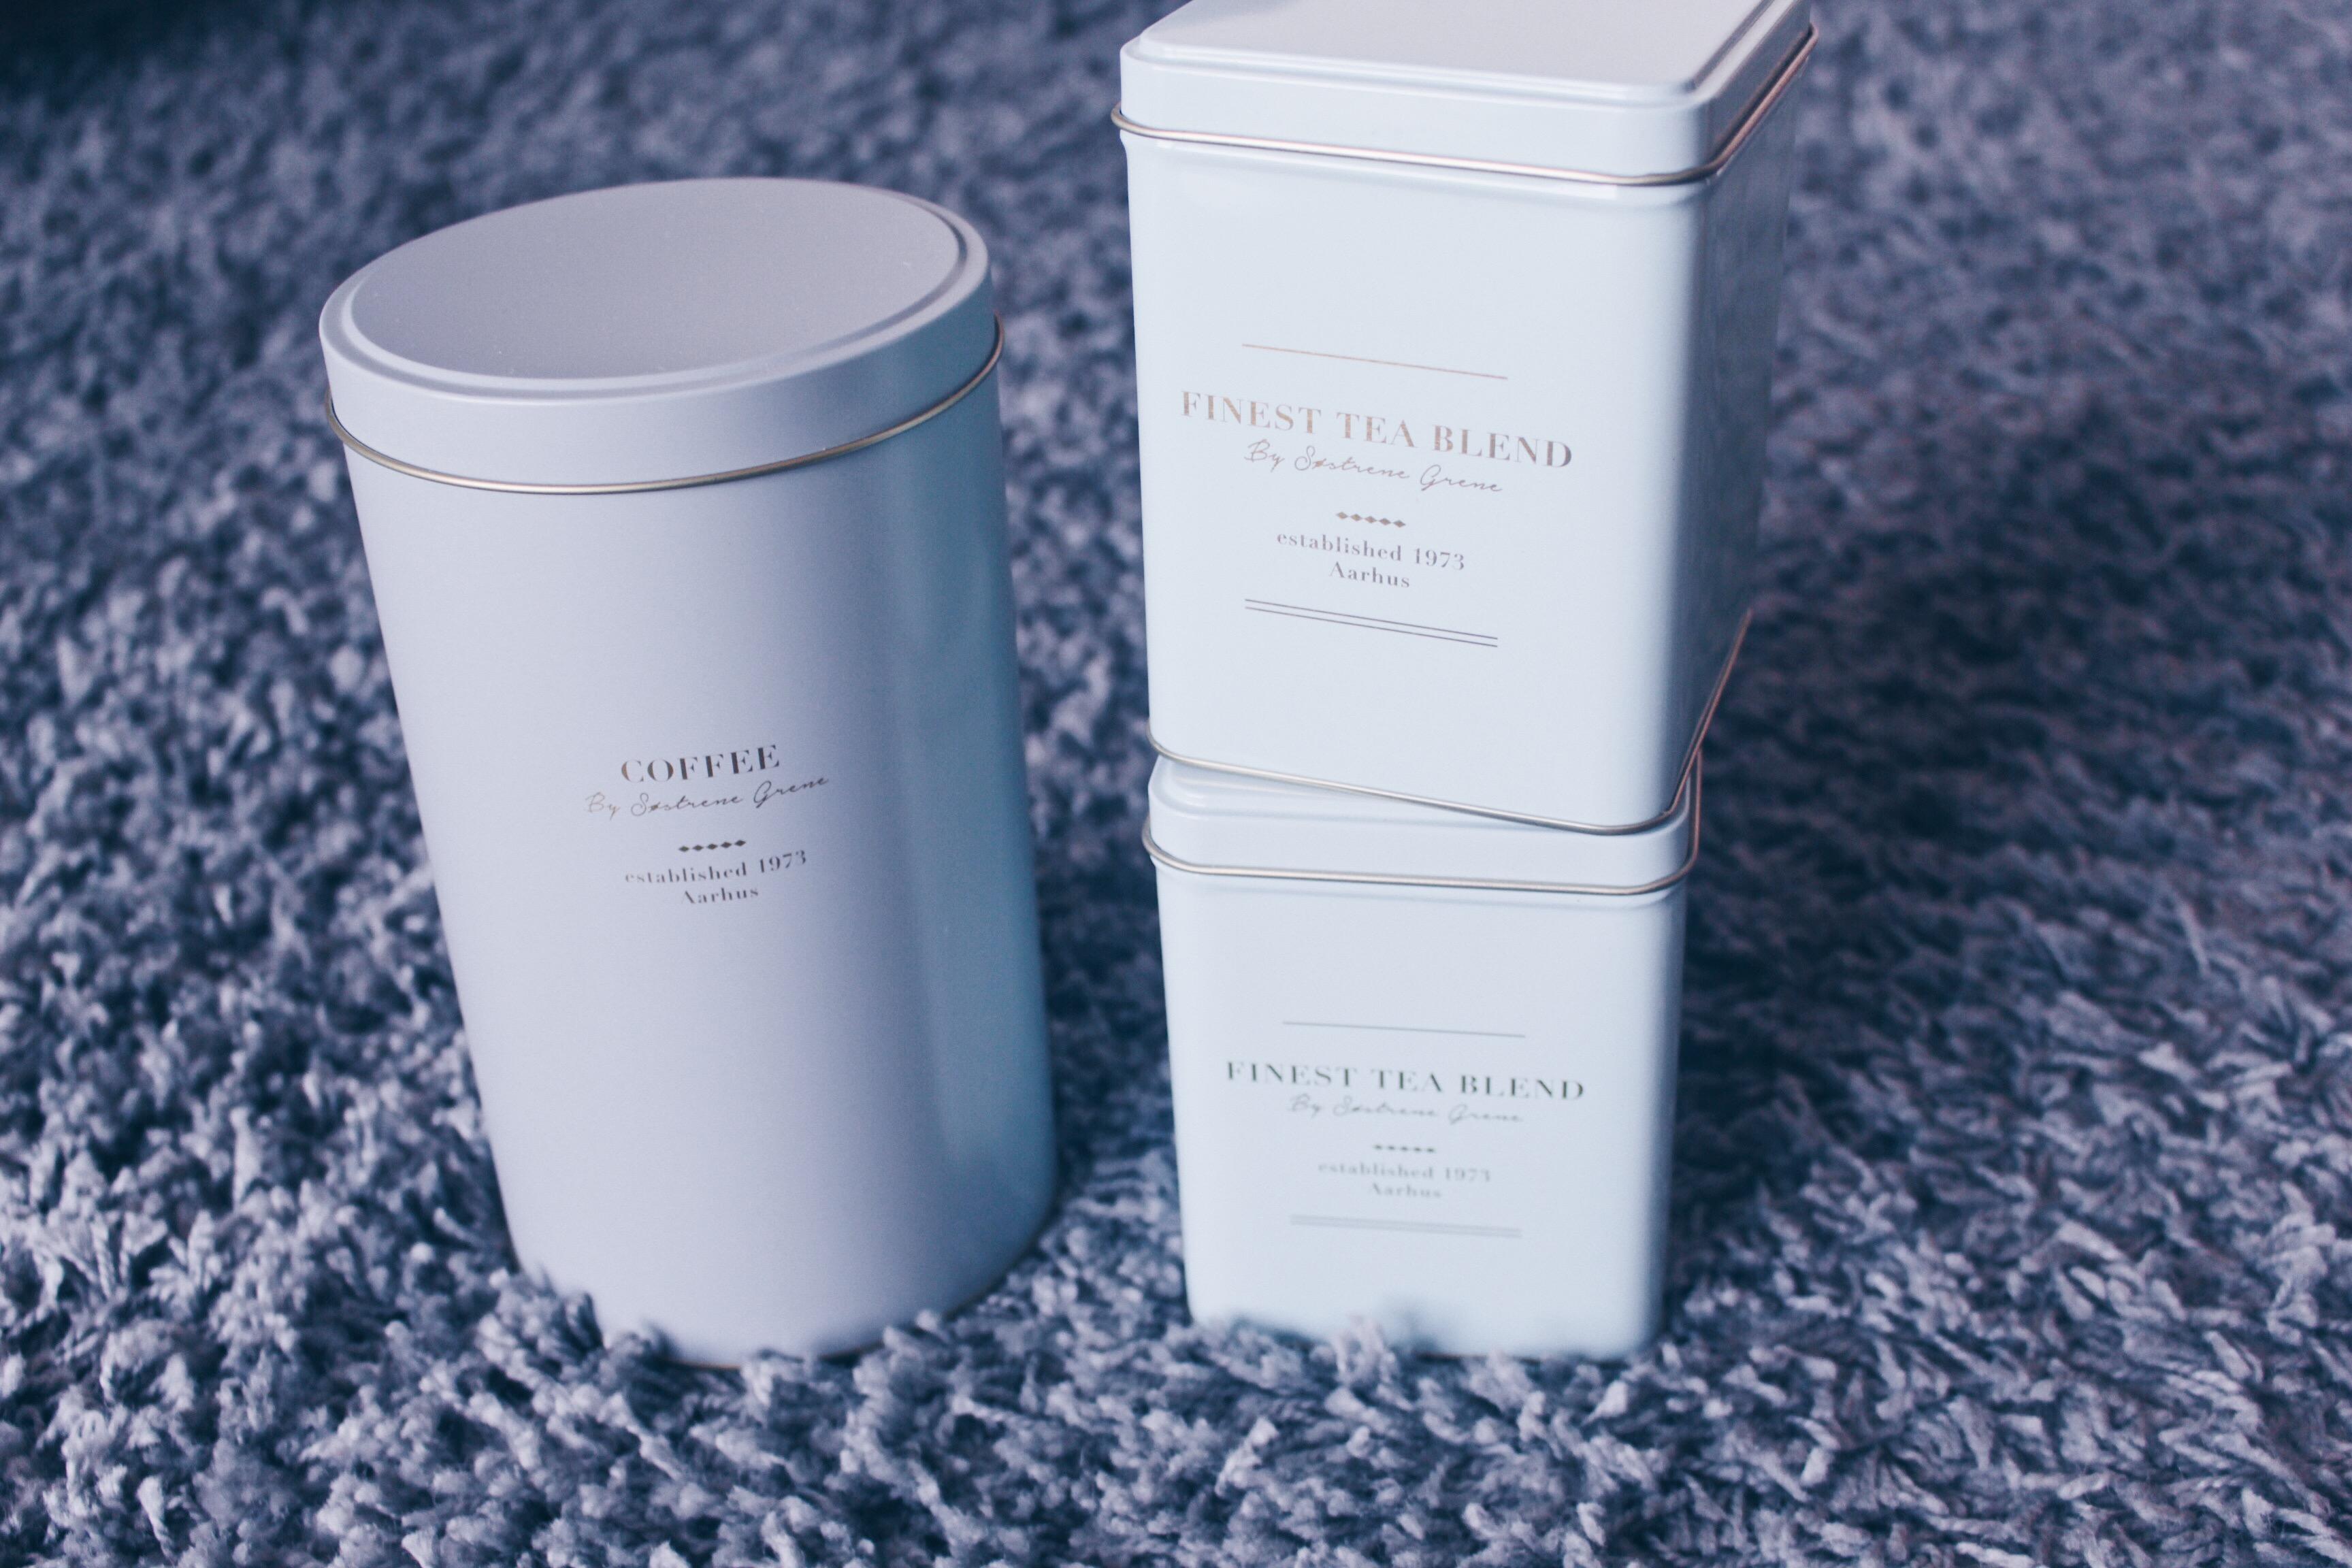 Sostrene Grene Haul Kaffee Tee